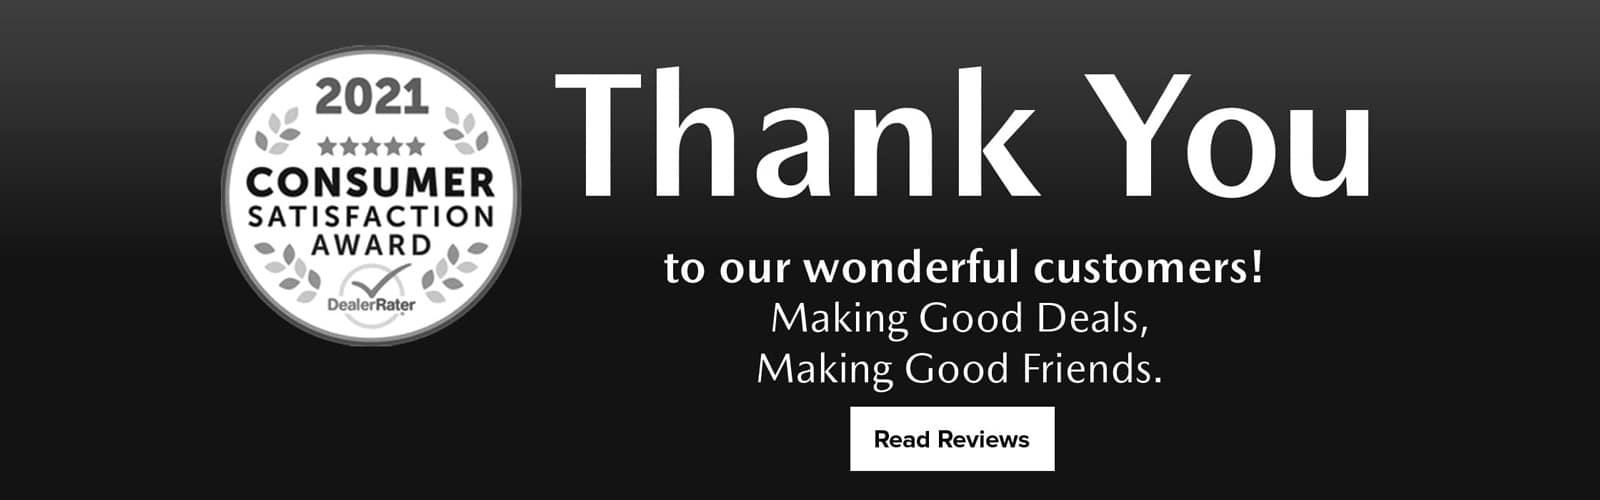 5_21_WV_Mazda_1600x500_customer_satisfaction